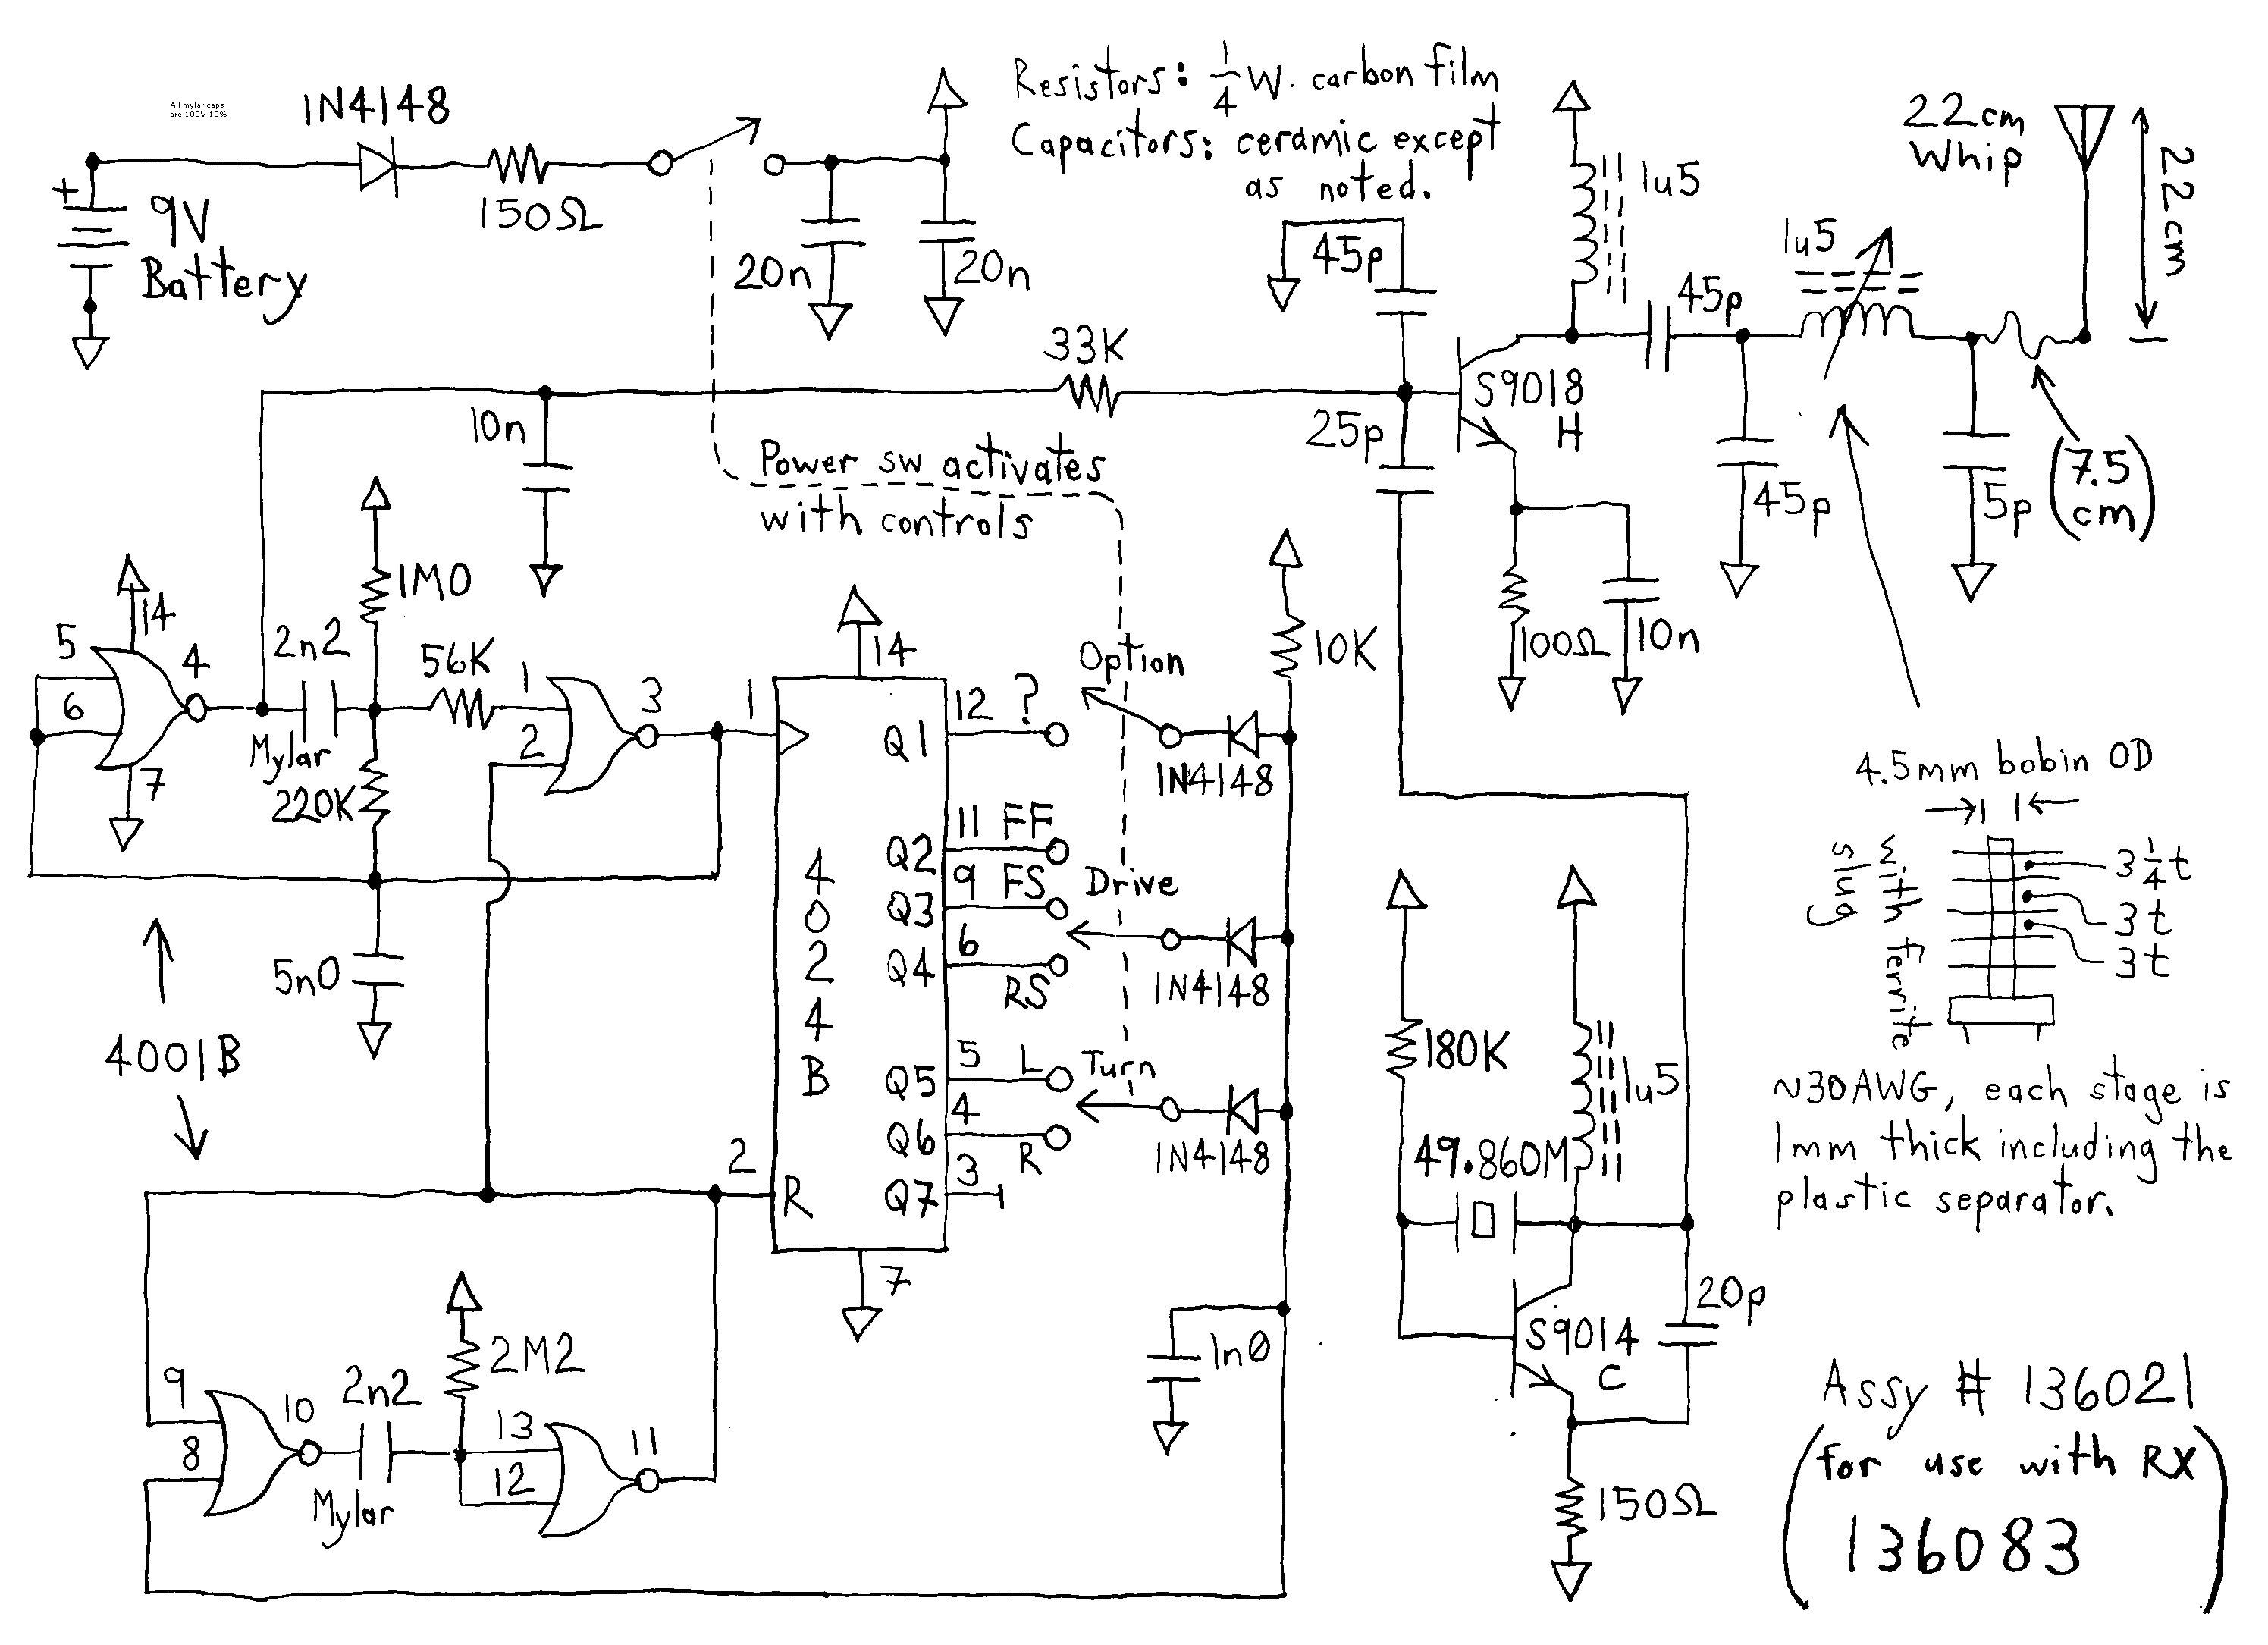 rc car receiver wiring diagram wiring diagram 7 Pole Wiring Diagram jada rc car wiring diagram wiring diagramjada rc car wiring diagram wiring diagram libraryjada rc car